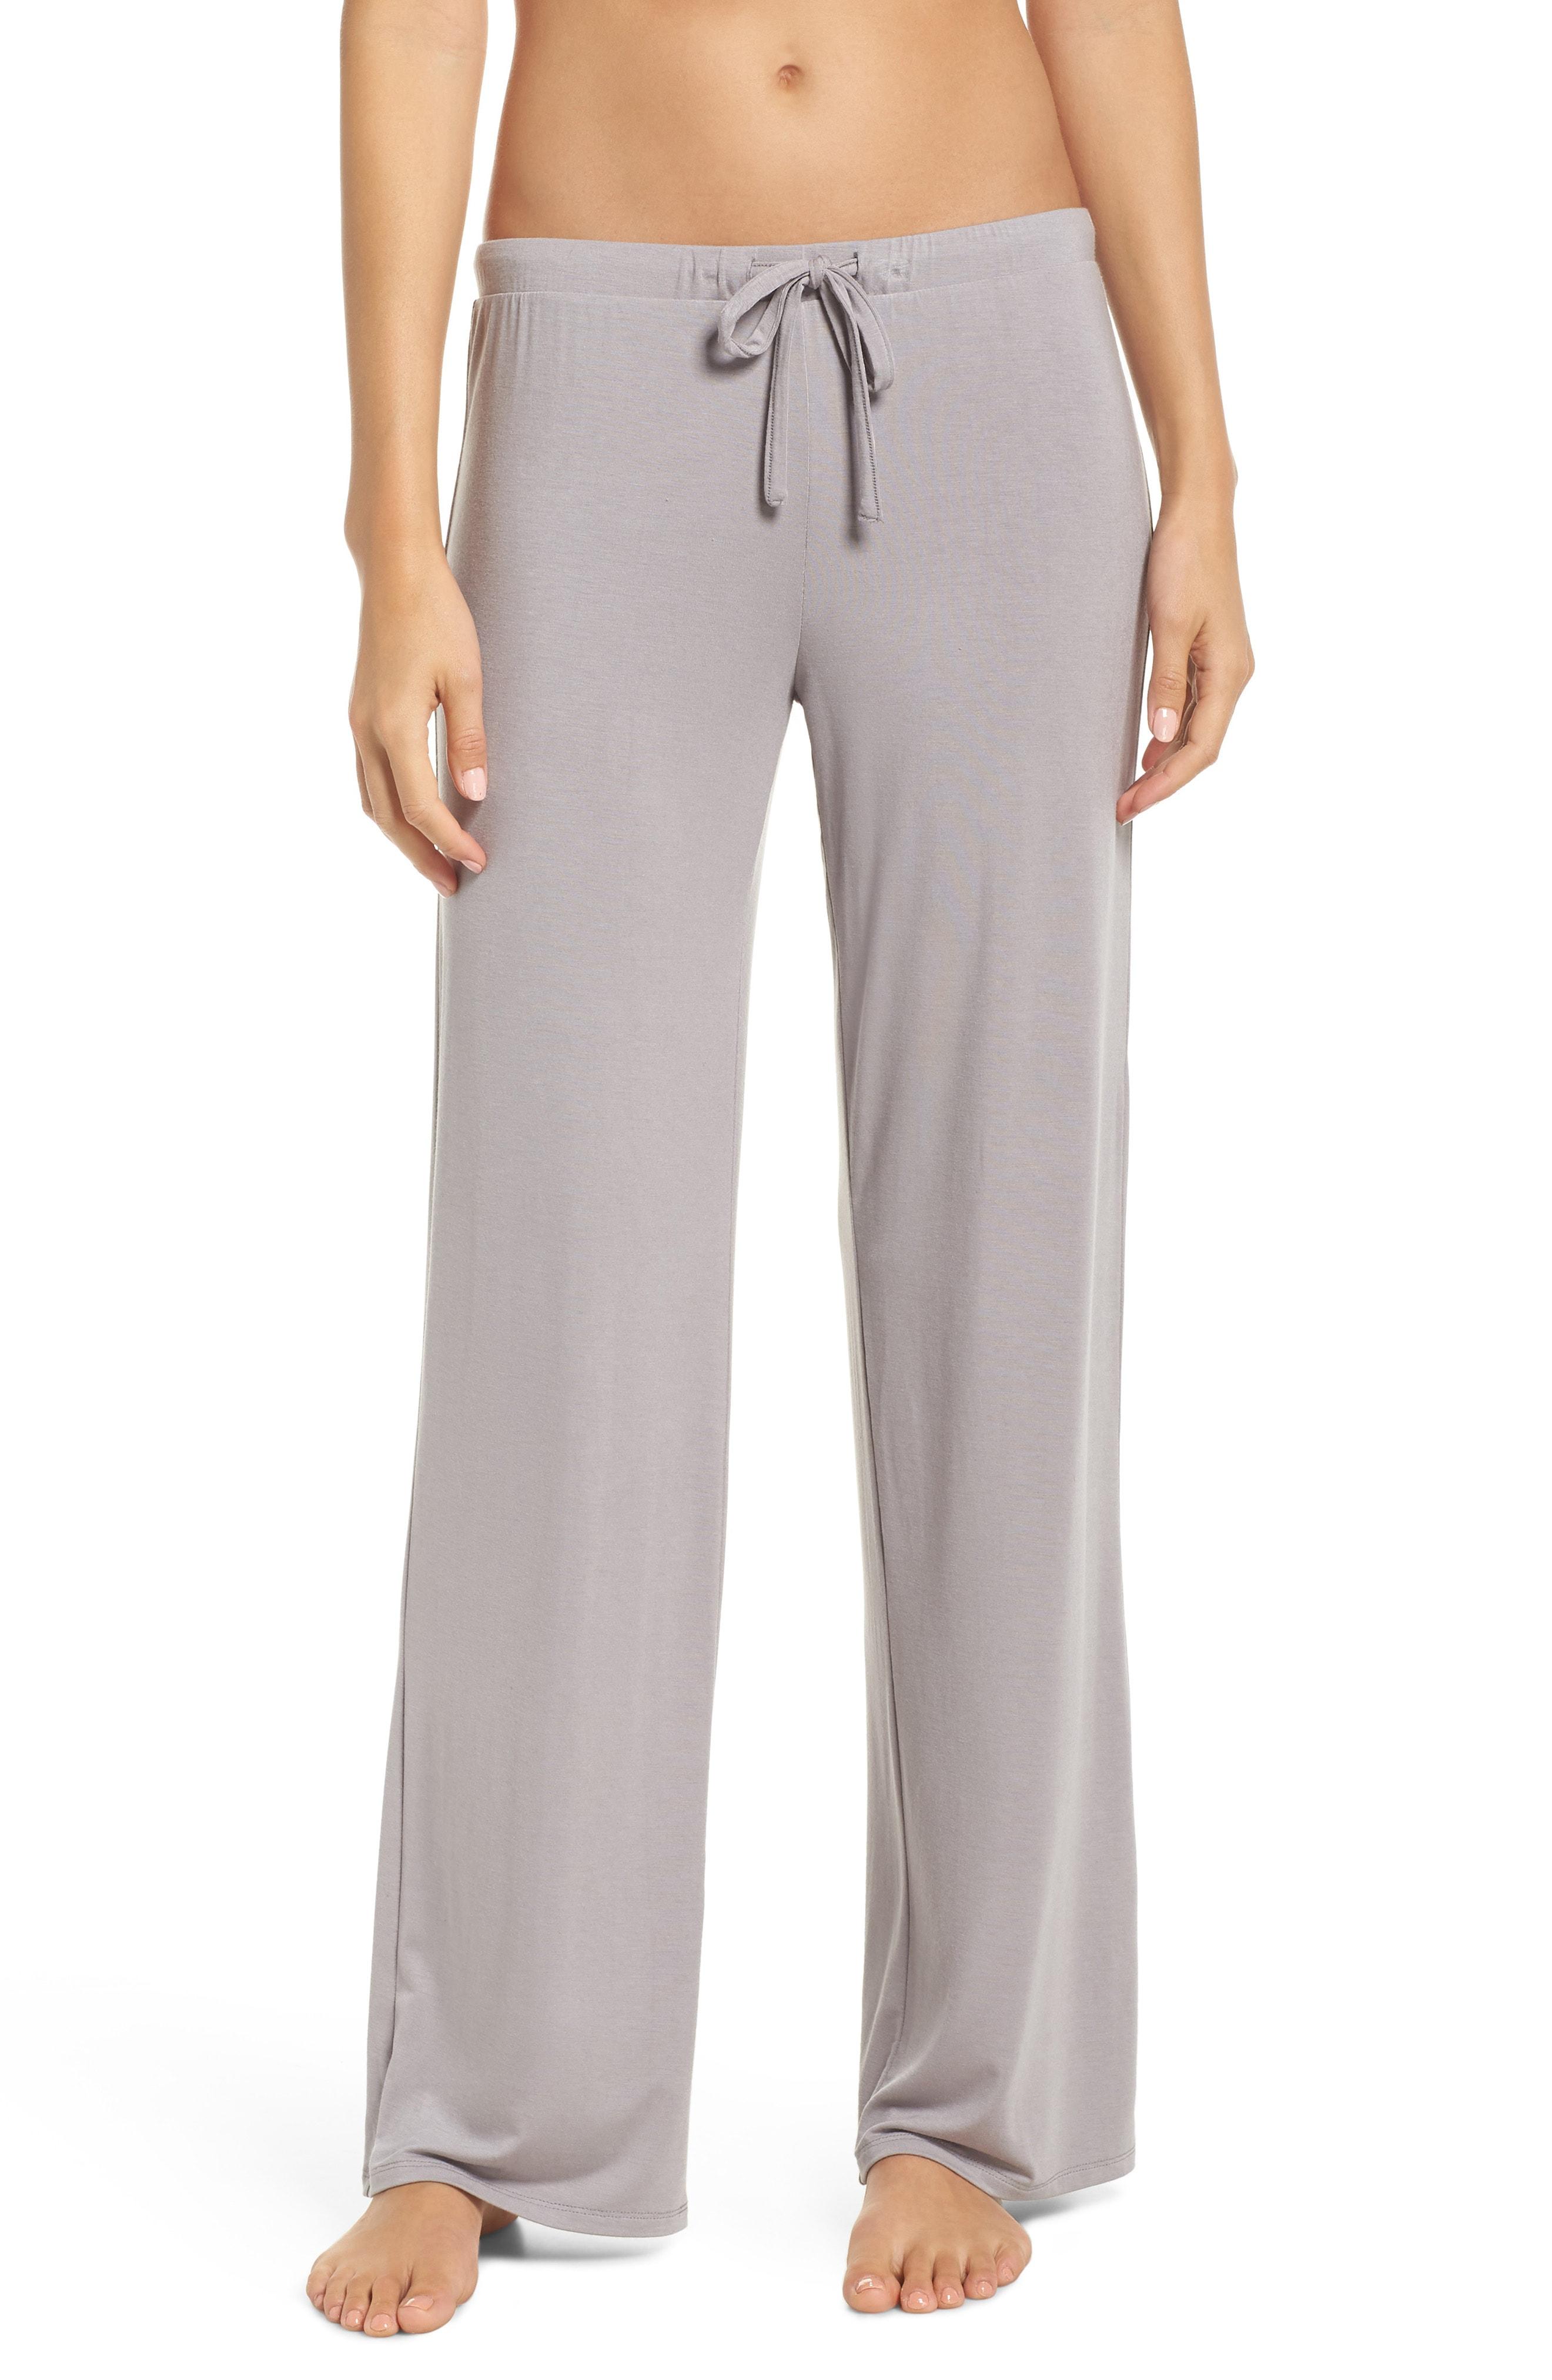 Nordstrom Lingerie Breathe Stretch Modal Pants (2 for $75)